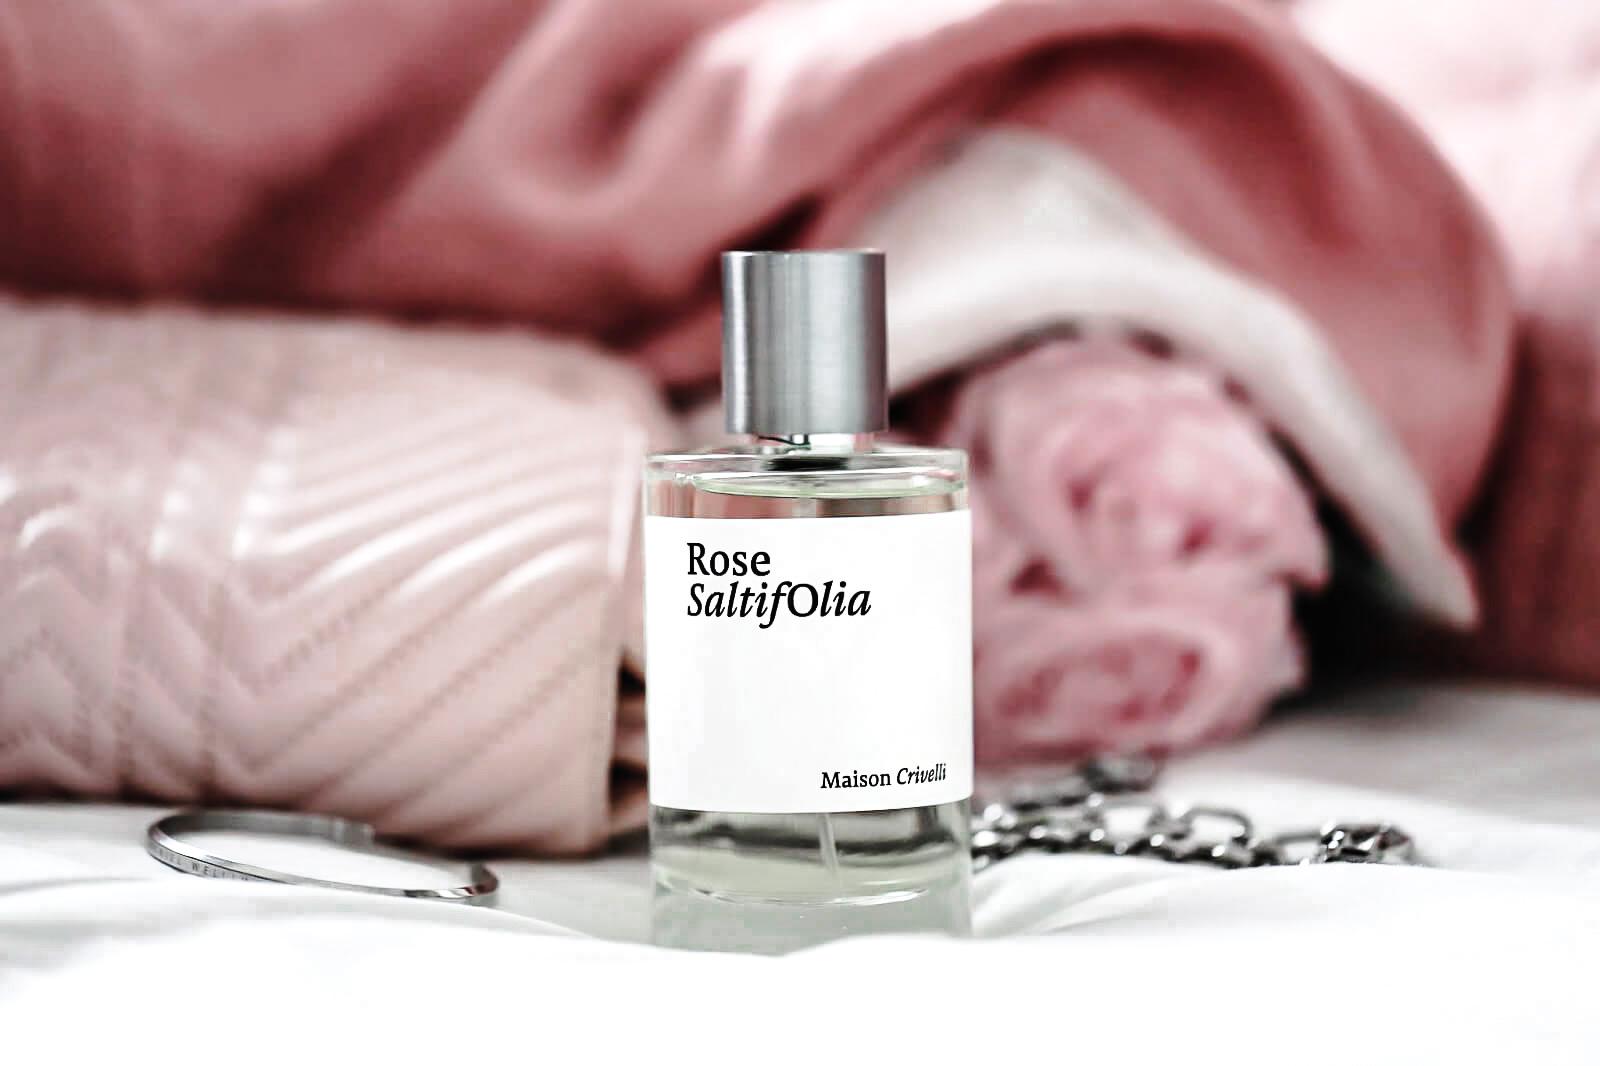 Maison Crivelli Rose Saltifolia Parfum Avis